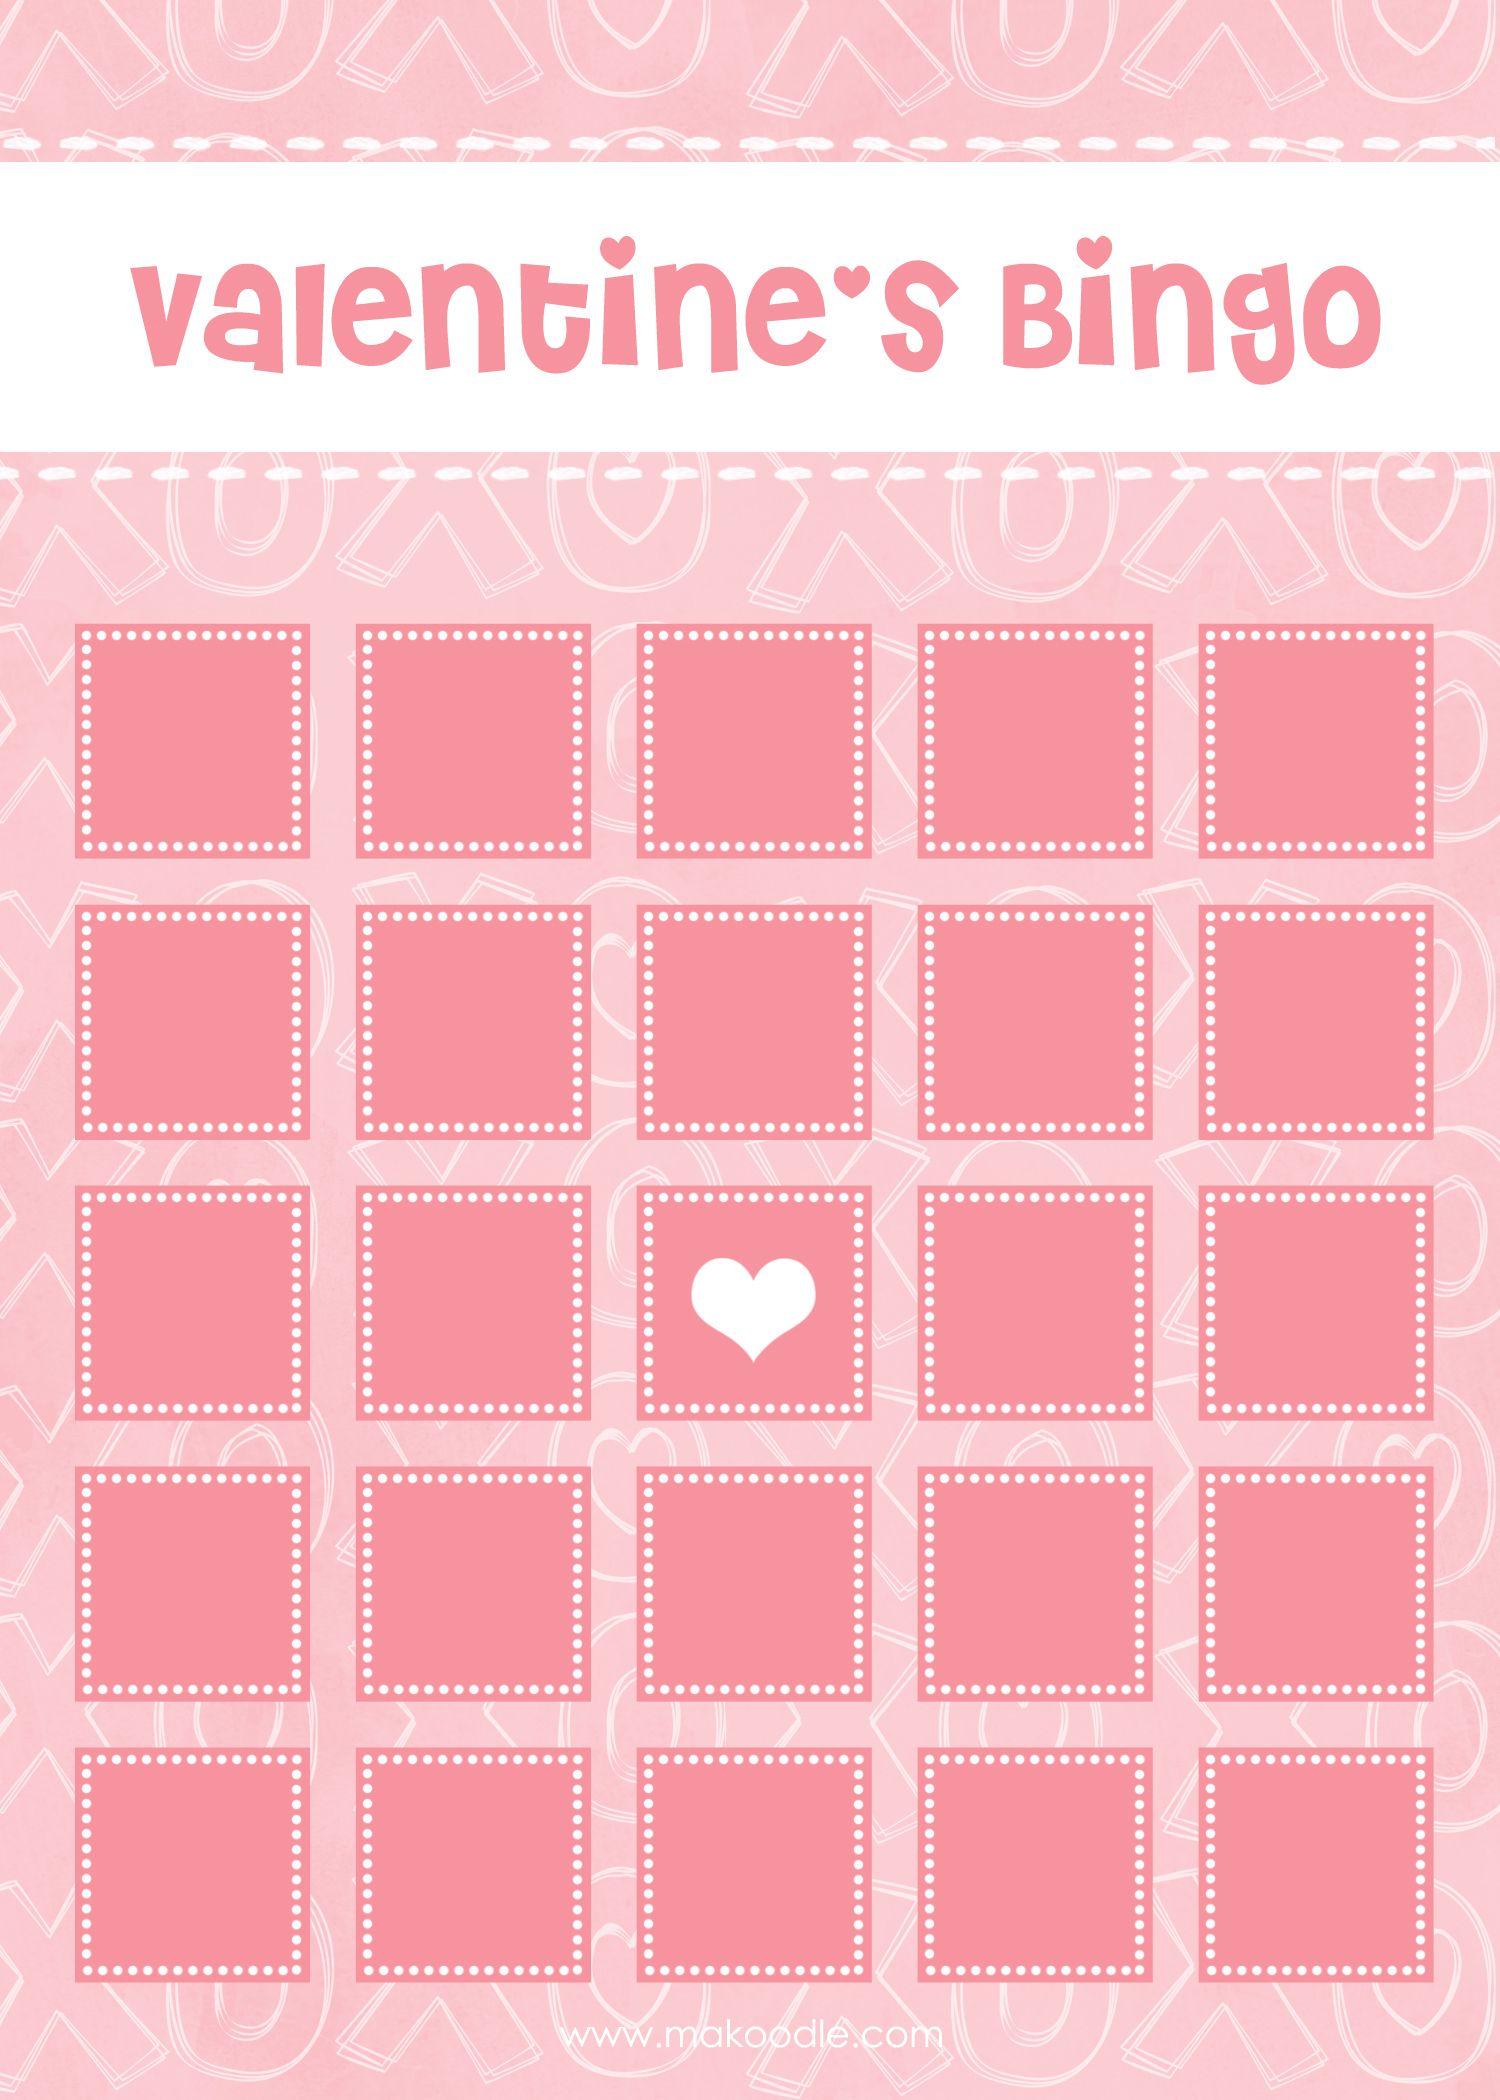 Valentines Bingo Xoxo Blank Blog 1 500 2 100 Pixels